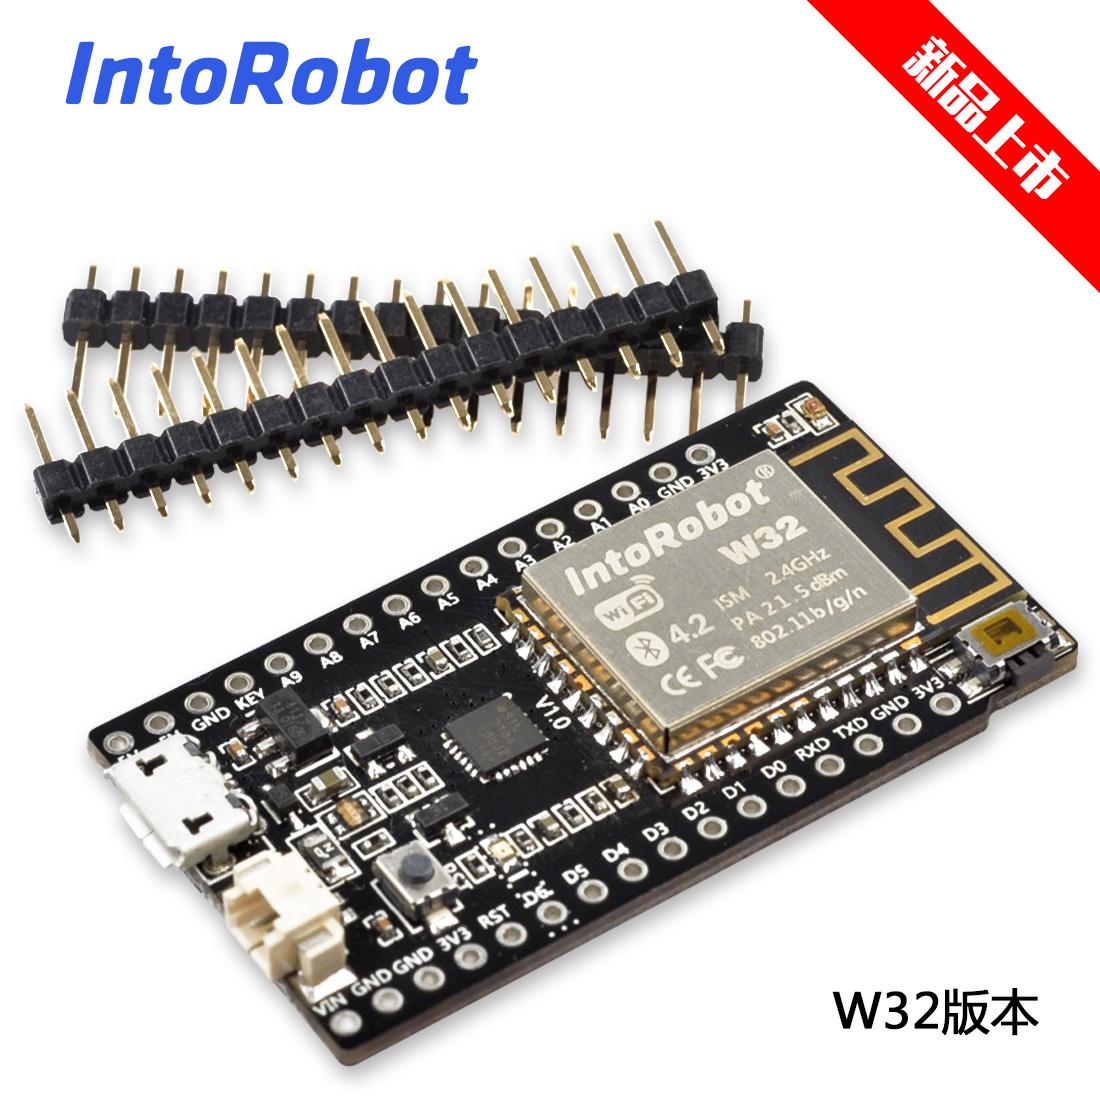 IntoRobot-Fig open source IoT WiFi Bluetooth dual-mode core